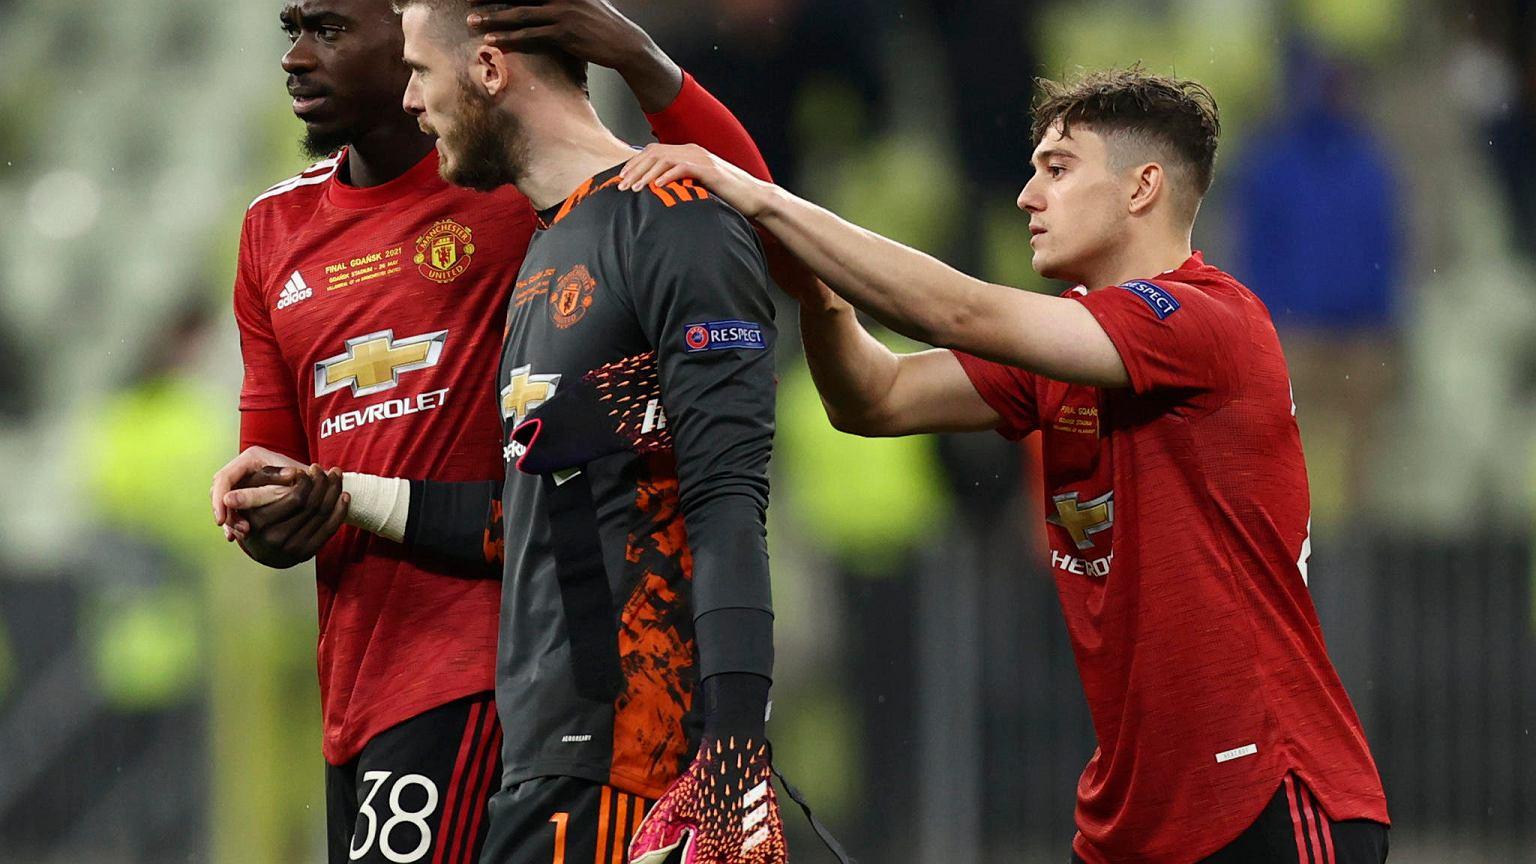 Manchester United znika z popularnej gry pi